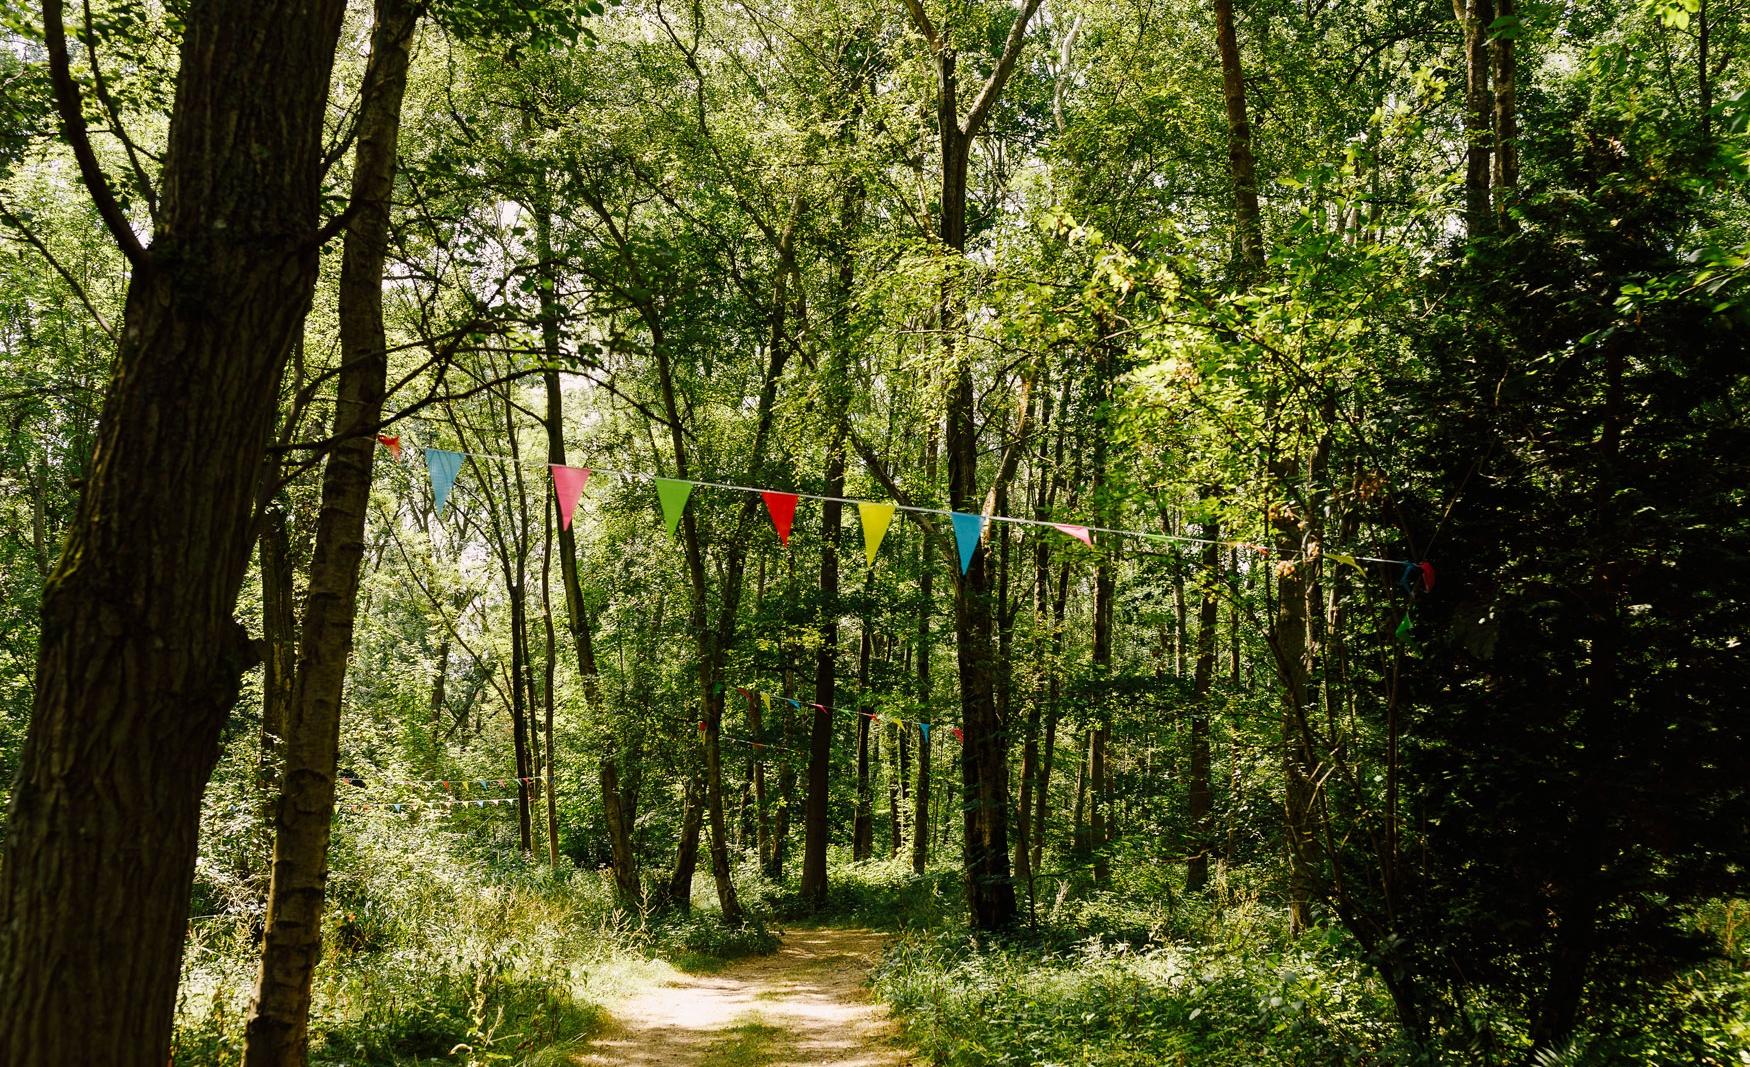 fiesta-fields-outdoor-wedding-events-company-tipi-surrey-sussex-spirit-lake-doking-4